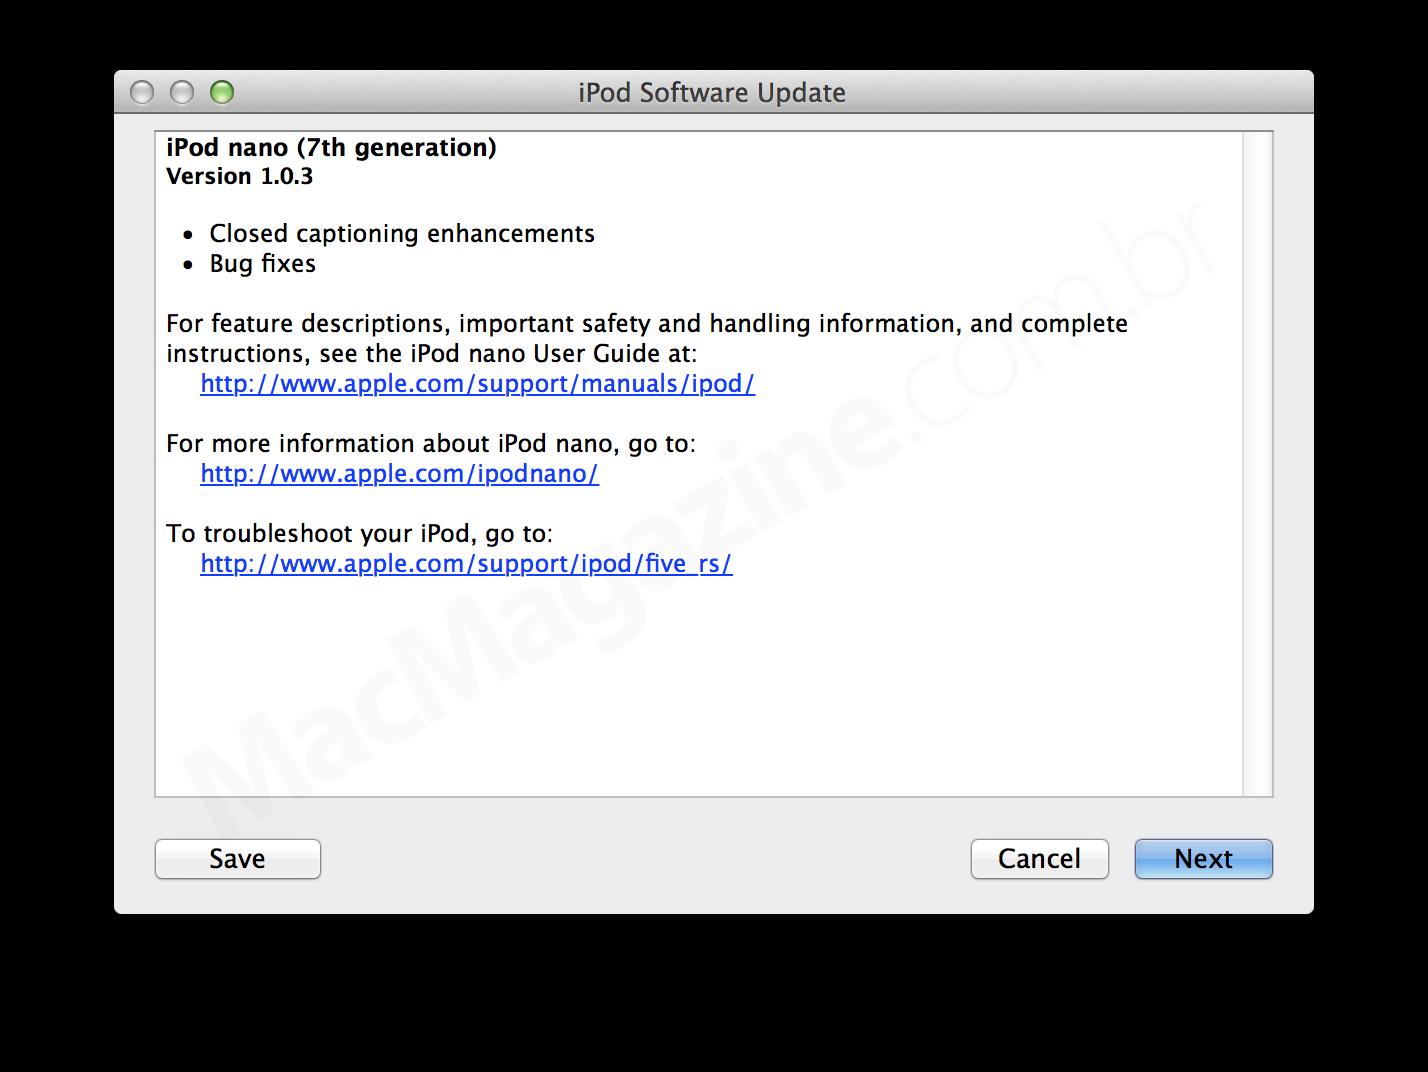 Update (1.0.3) para o iPod nano